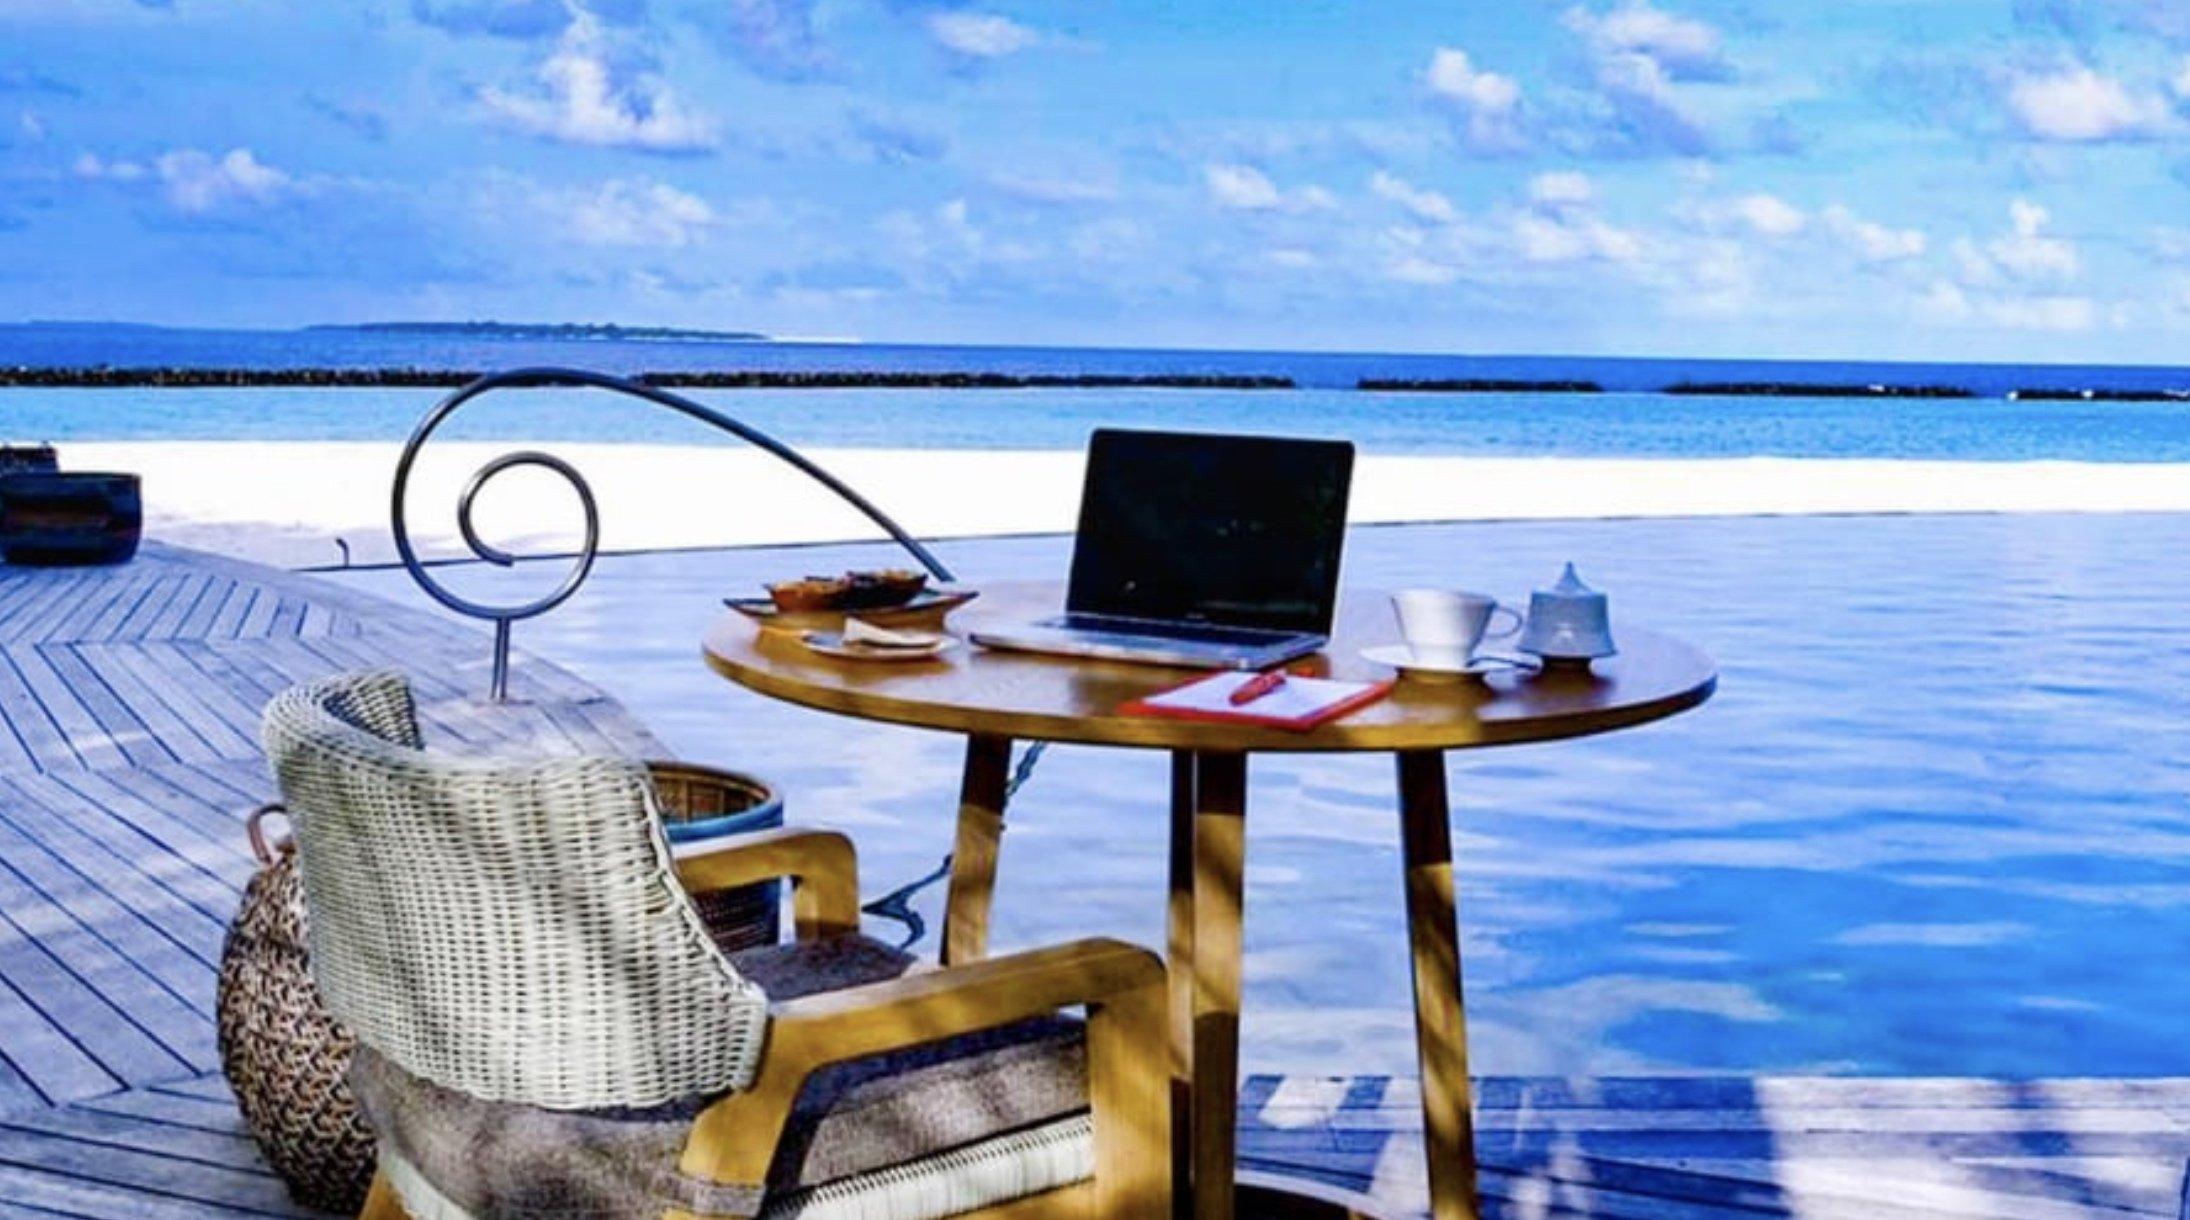 Remote Control: The Value of Remote Work